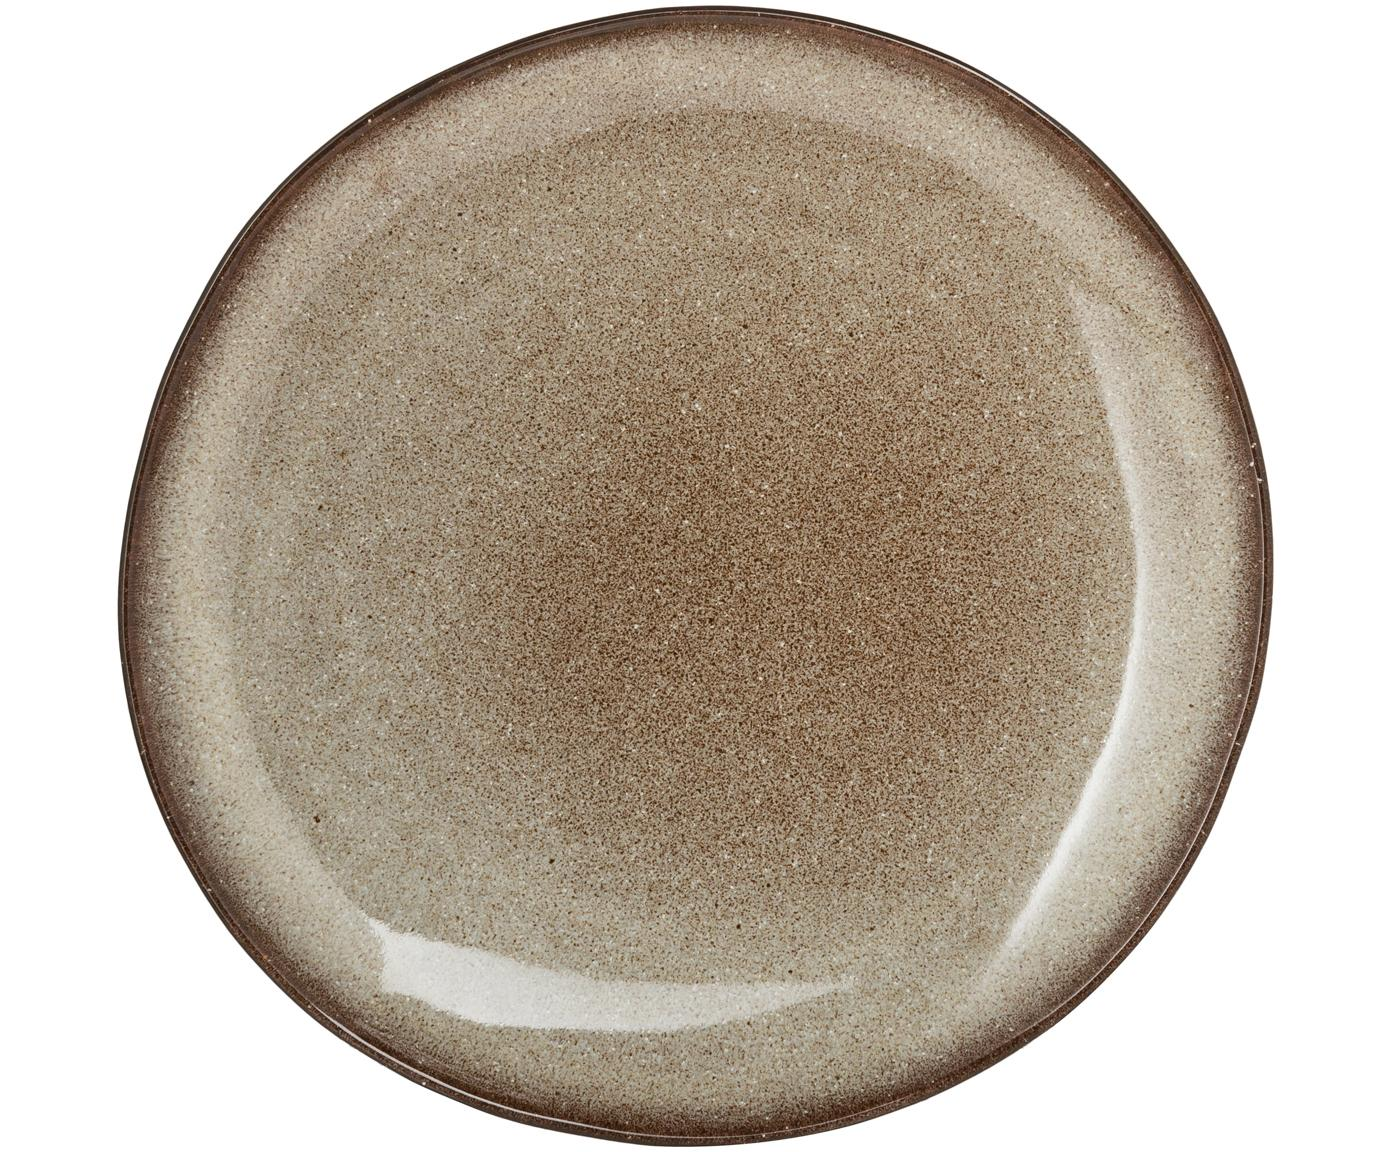 Plato artesanal Sandrine, Cerámica, Gris claro, beige, Ø 22 x Al 2 cm